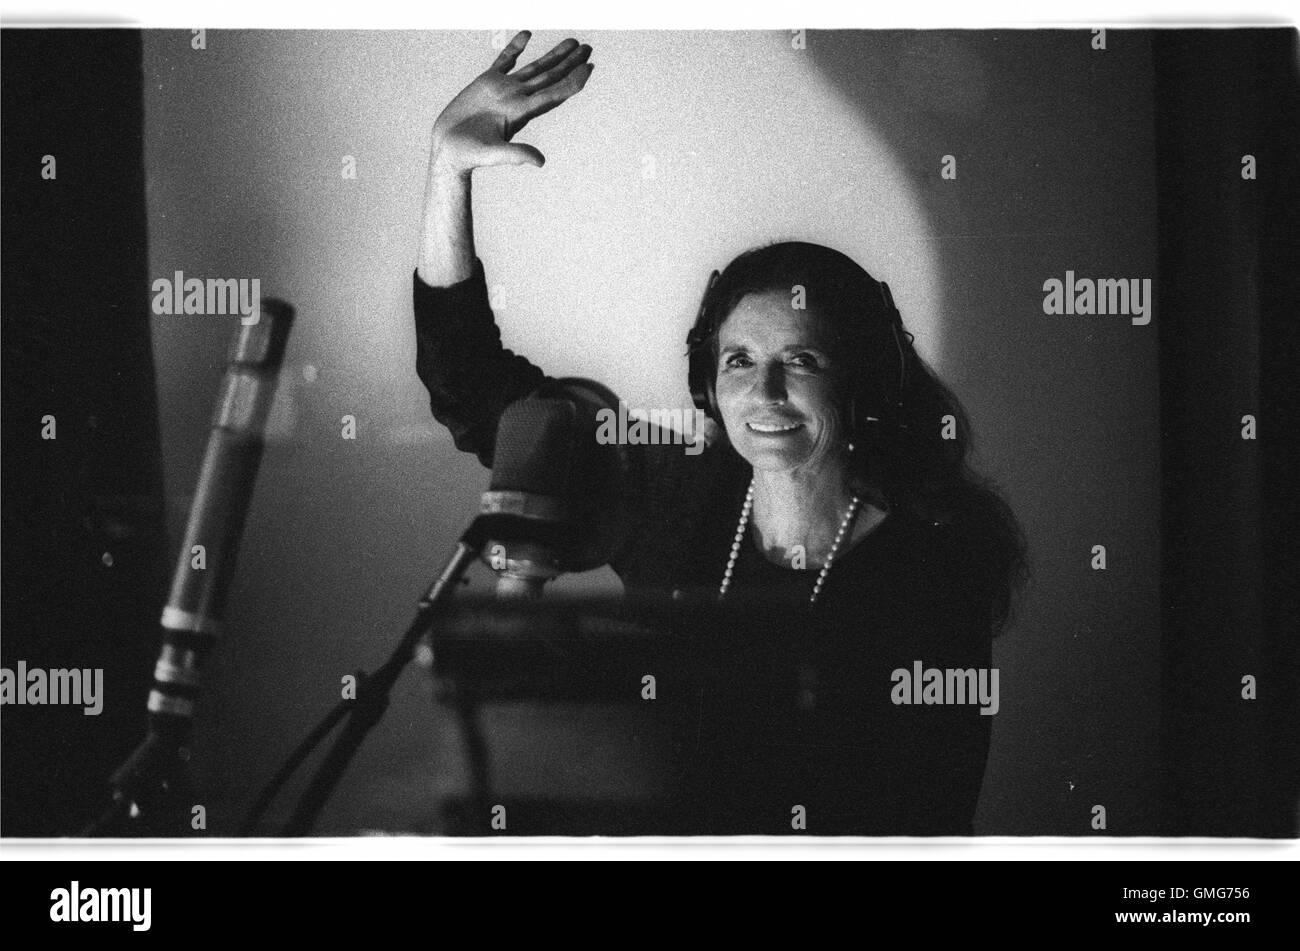 Johnny Cash Stock Photos & Johnny Cash Stock Images - Alamy